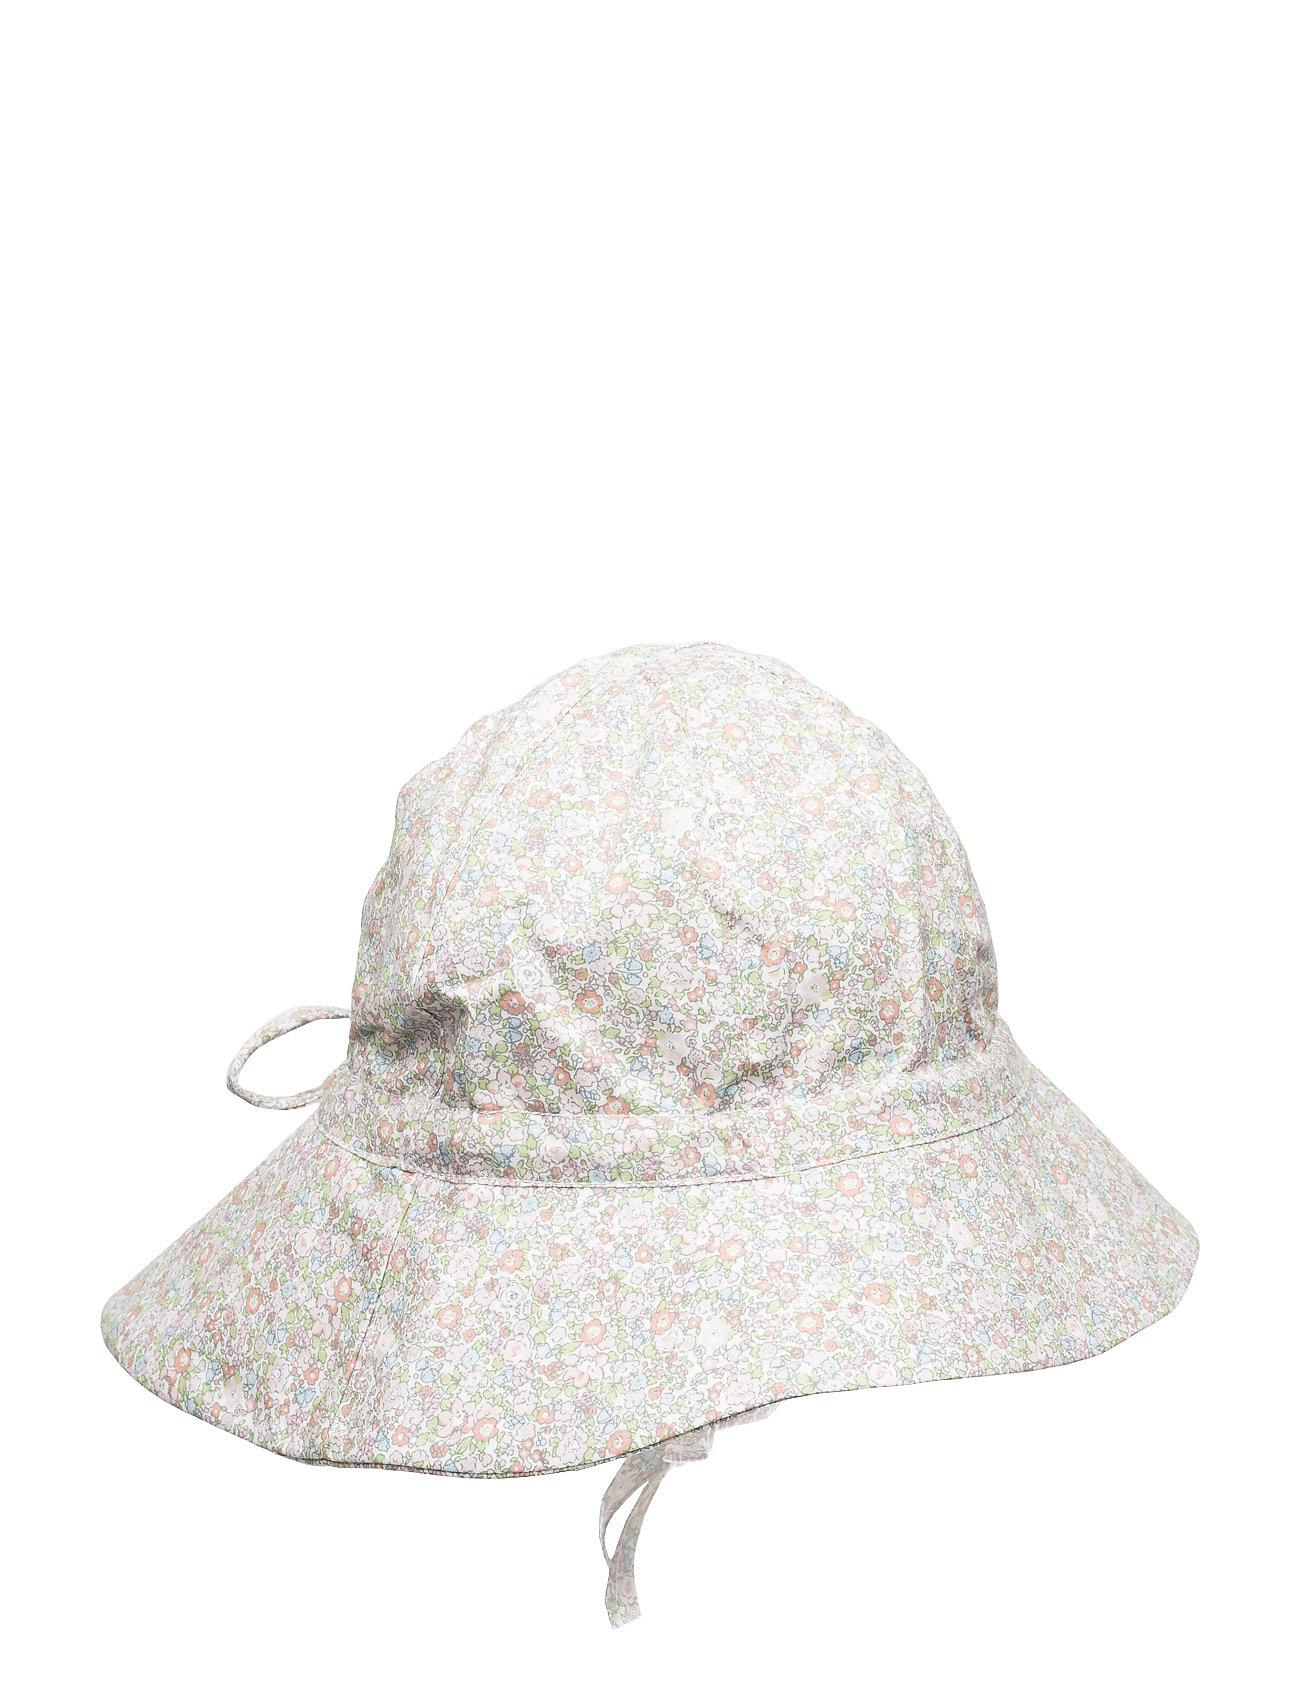 Baby Girl Sun Cap Wheat Accessories til Børn i